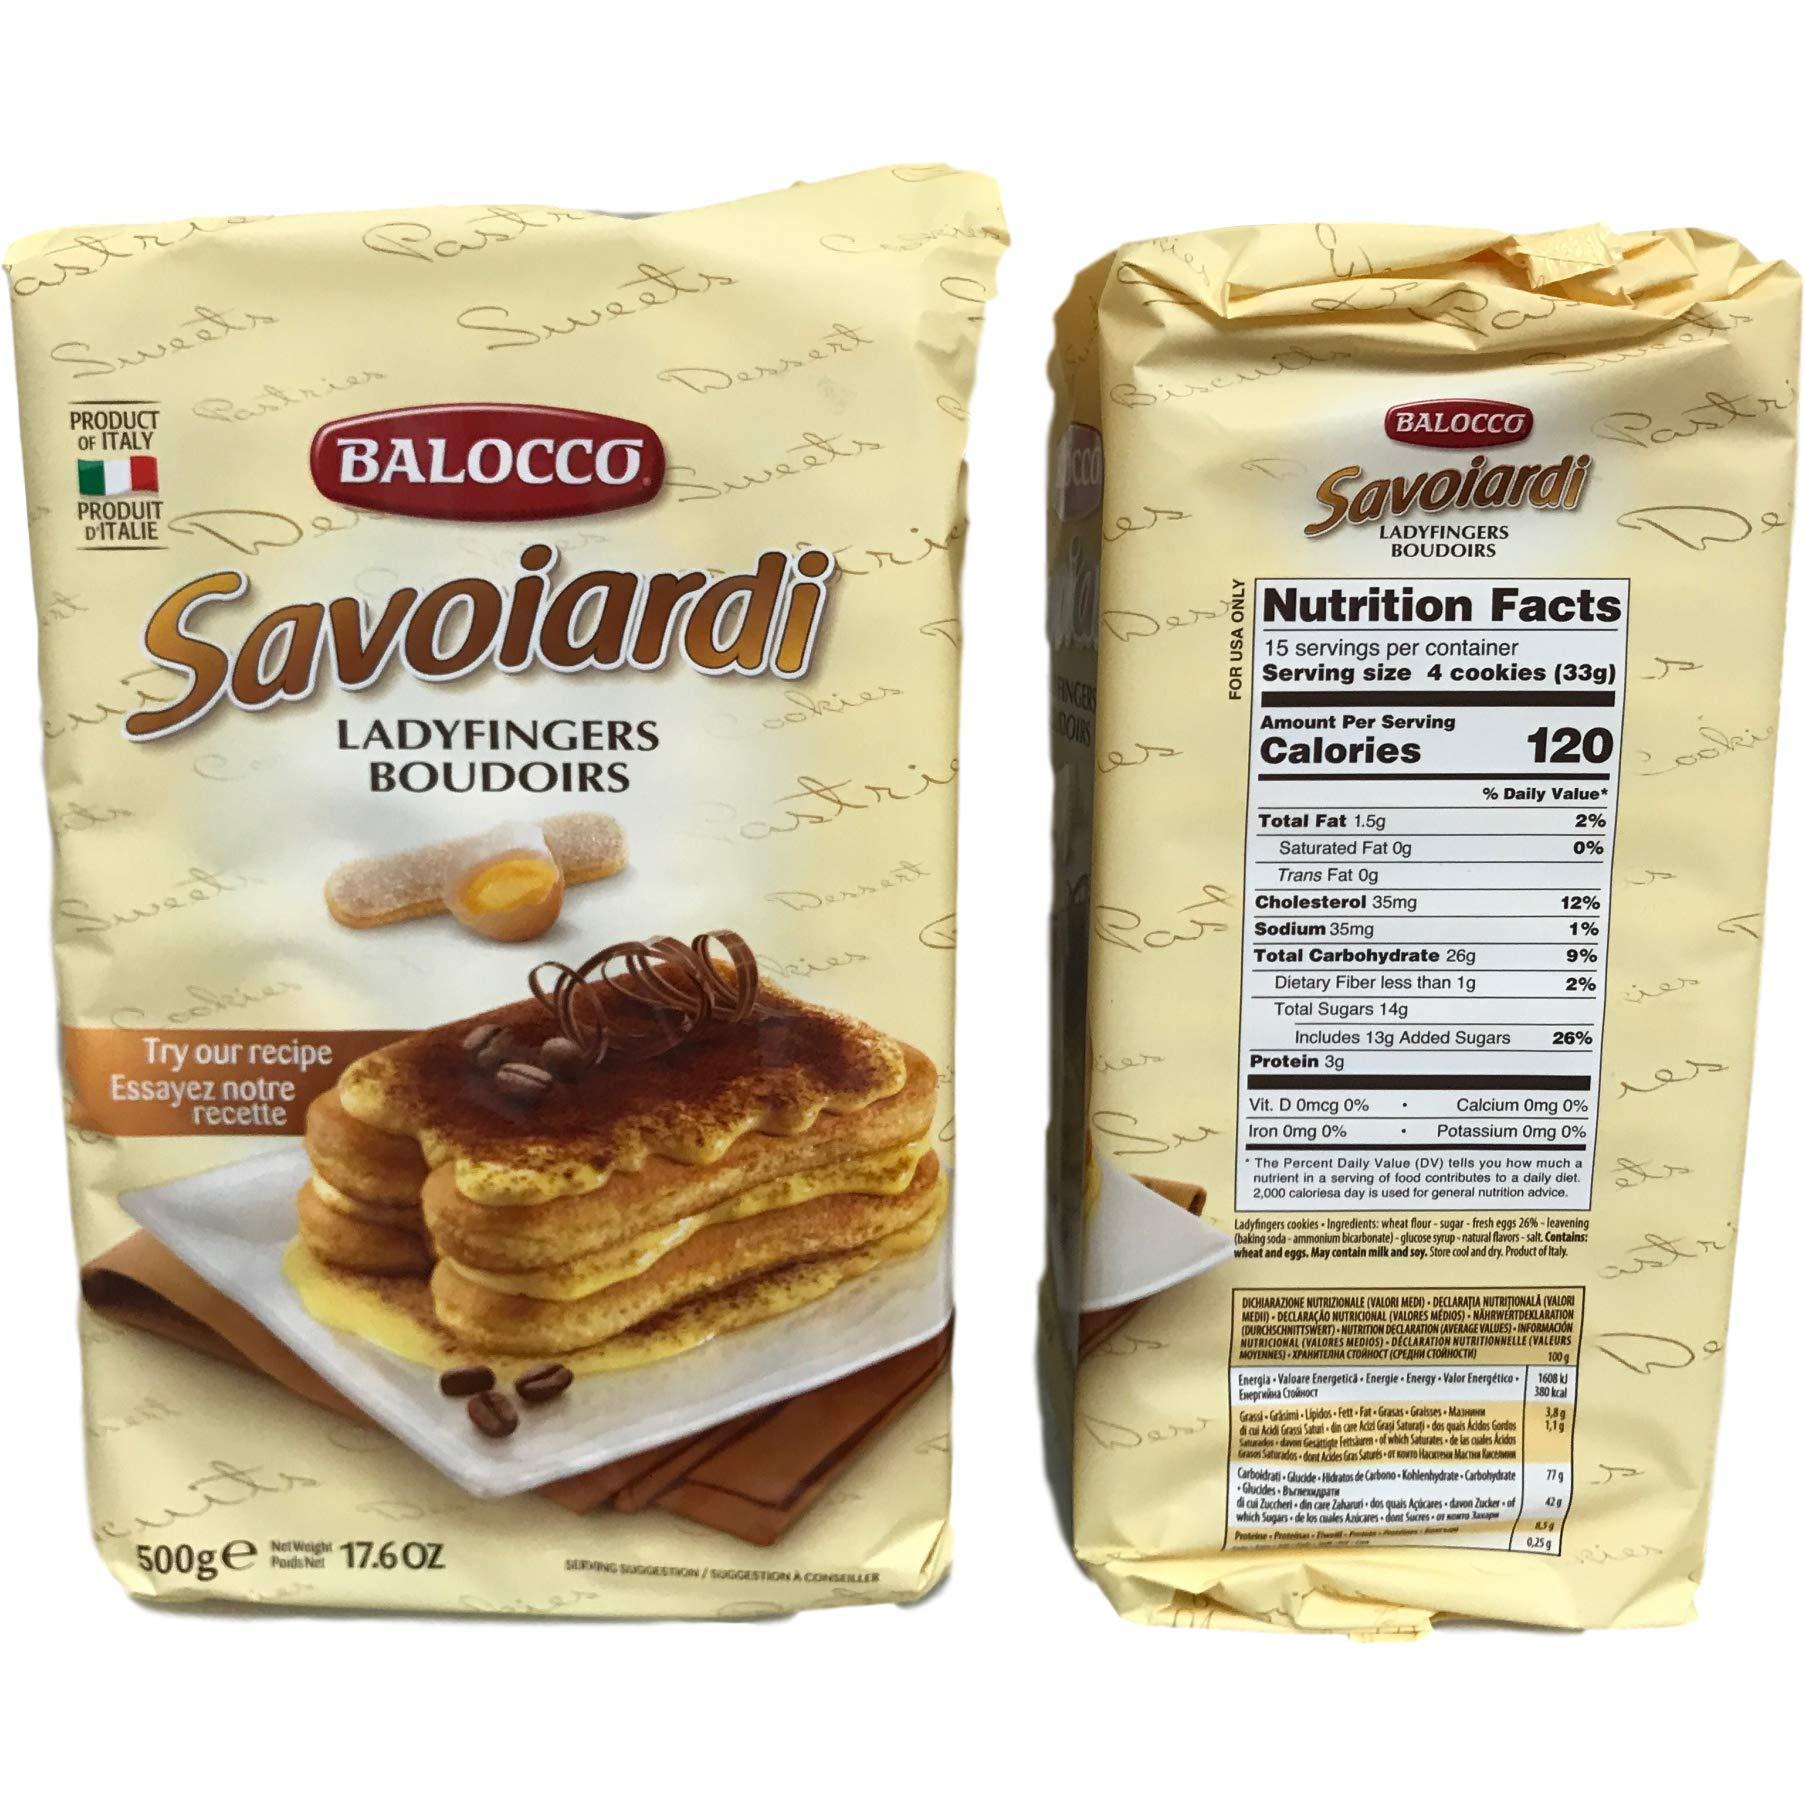 Balocco Savoiardi Lady Fingers - 17.6 oz (2 Pack) by Balocco